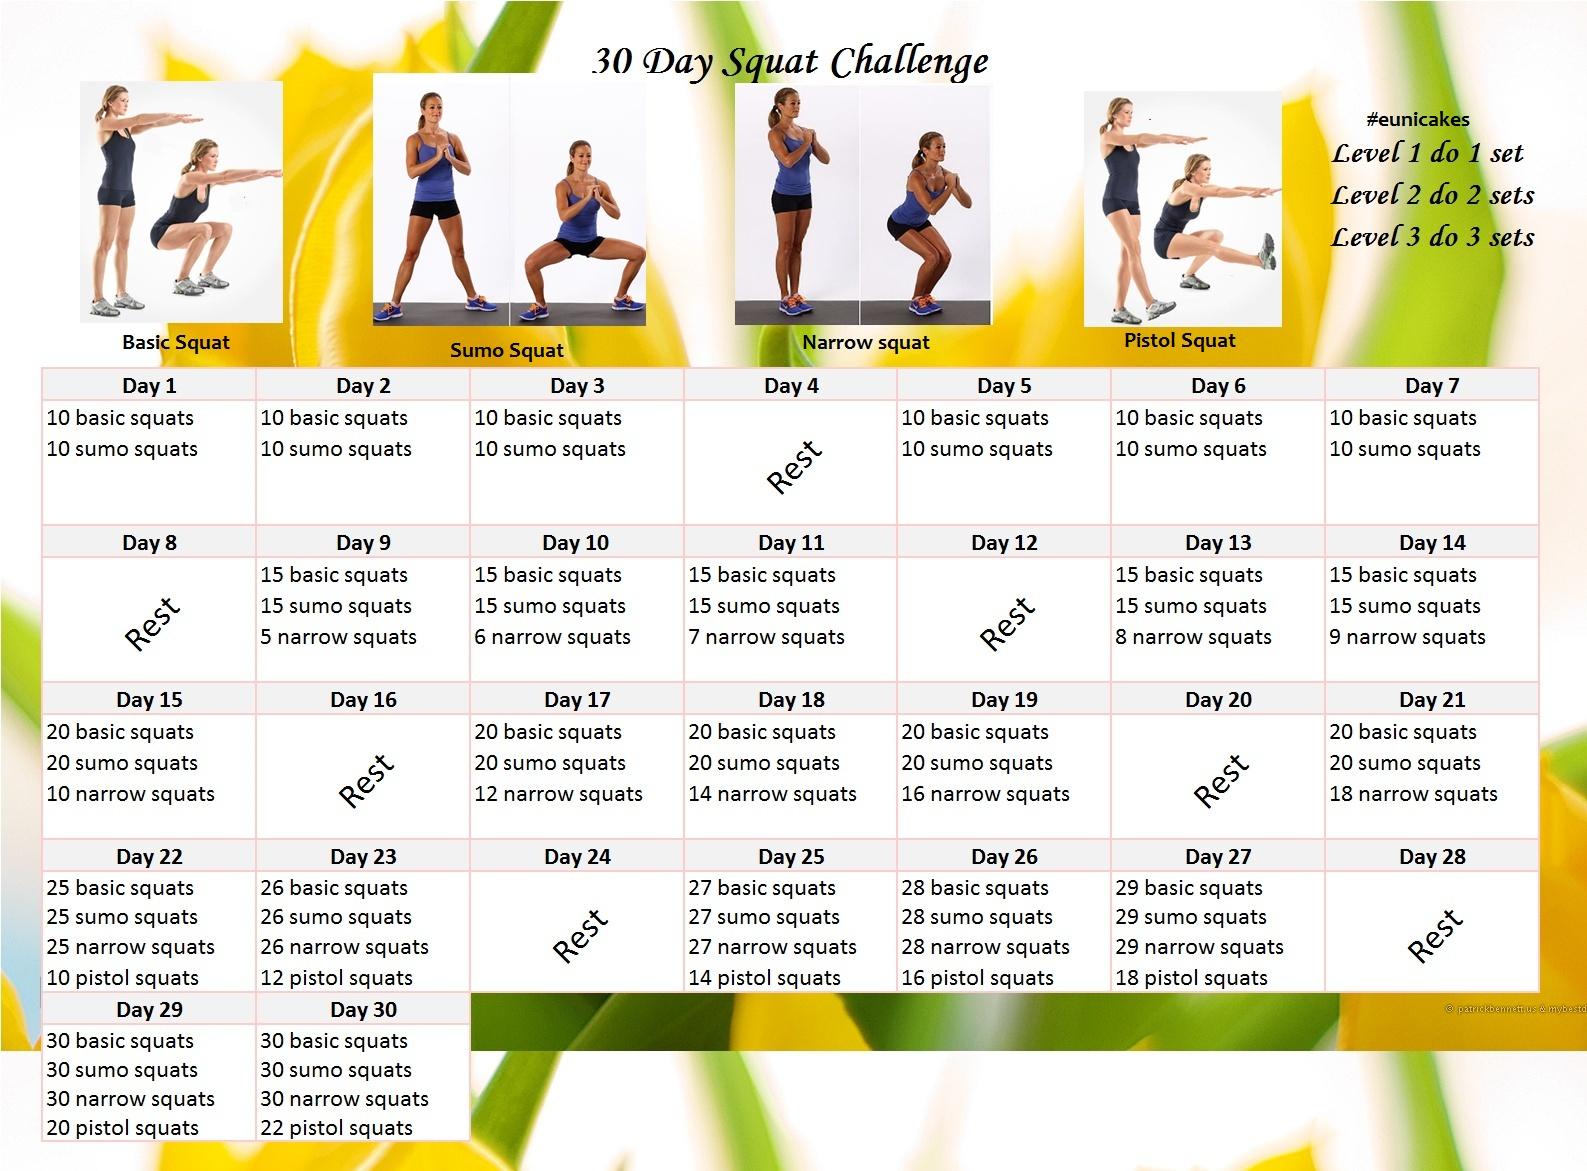 Fitness Challenge: 30 Day Squat Calendar Challenge | Eunicakes In Squat Challenge Calendar Beginner Printable